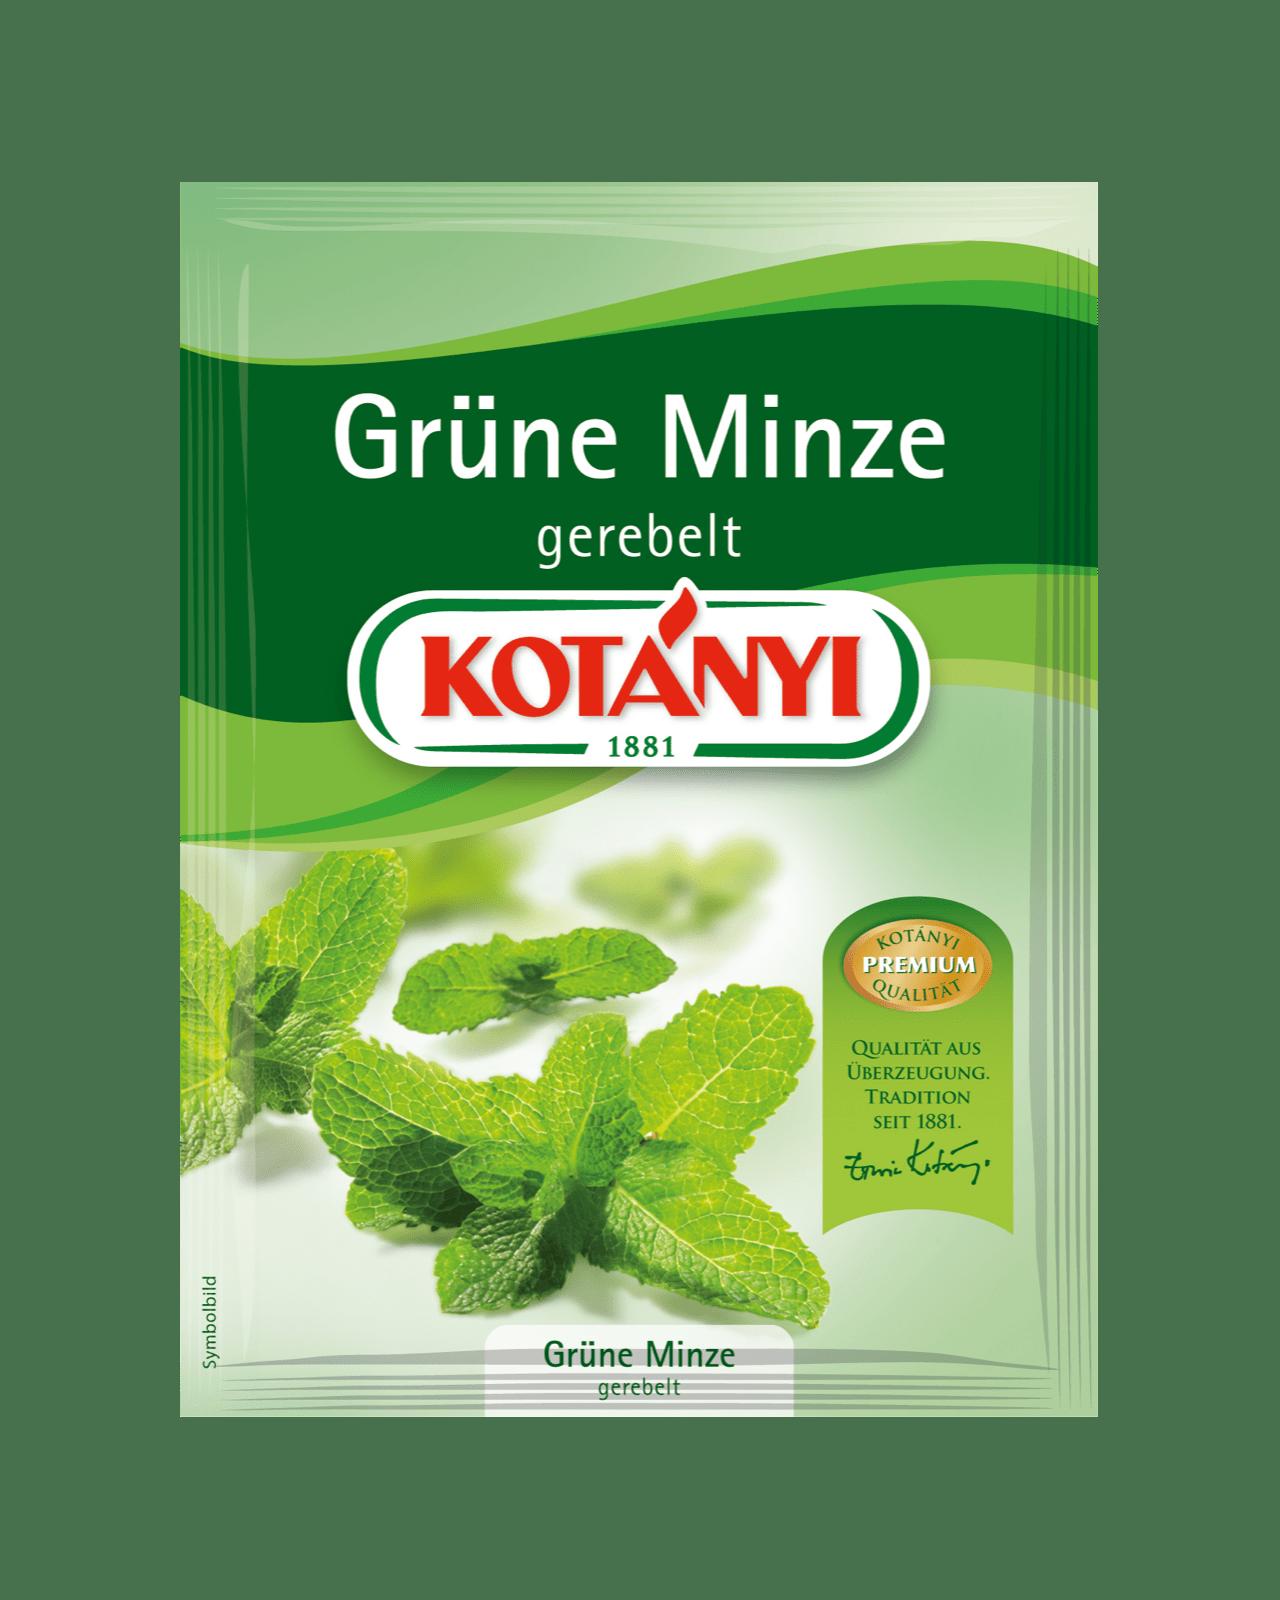 Kotányi Grüne Minze gerebelt im Brief